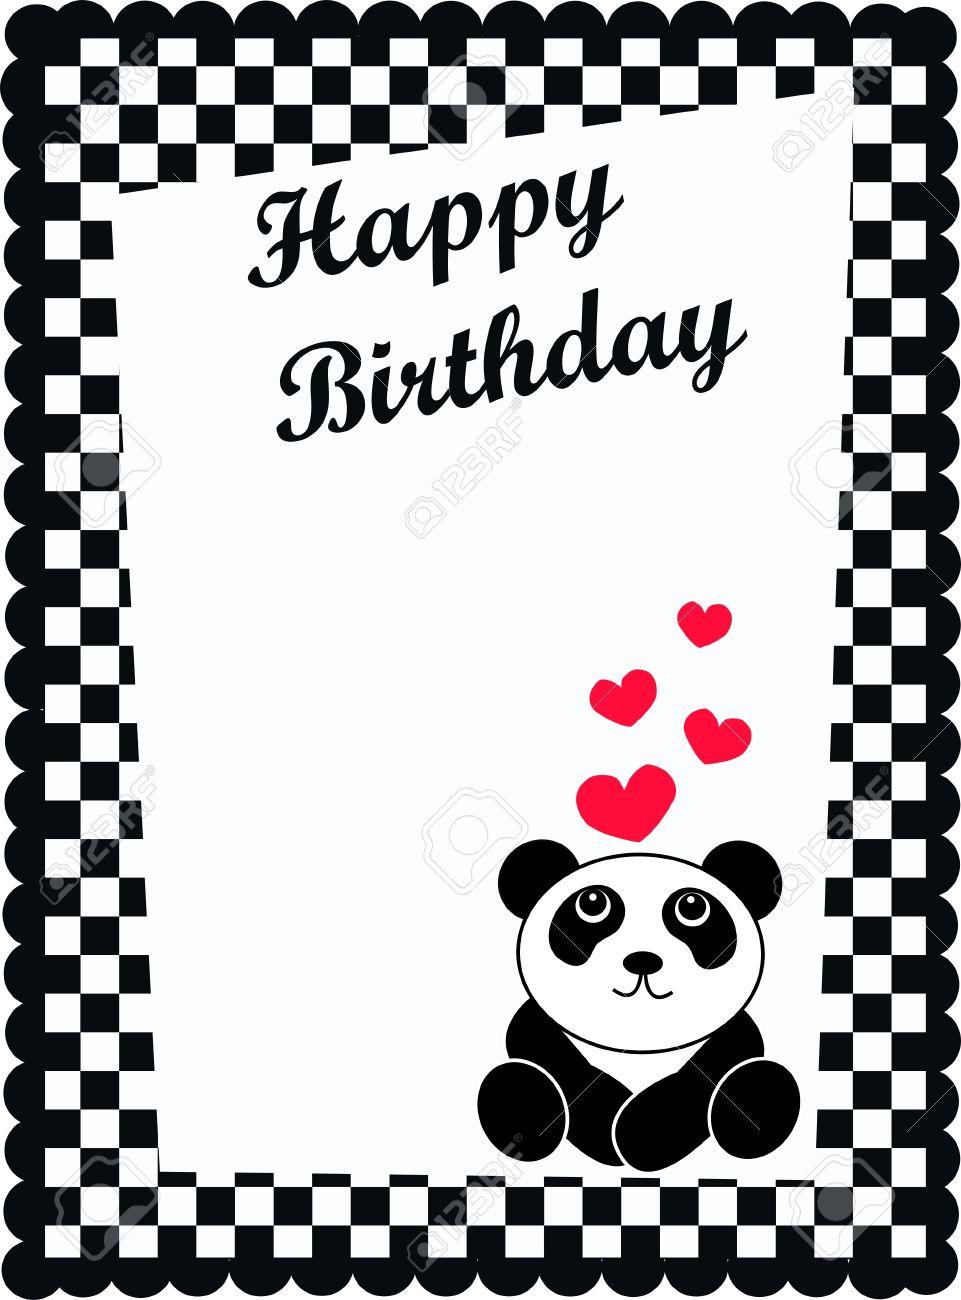 Happy birthday card with a cute panda bear royalty free cliparts happy birthday card with a cute panda bear stock vector 7558814 bookmarktalkfo Image collections